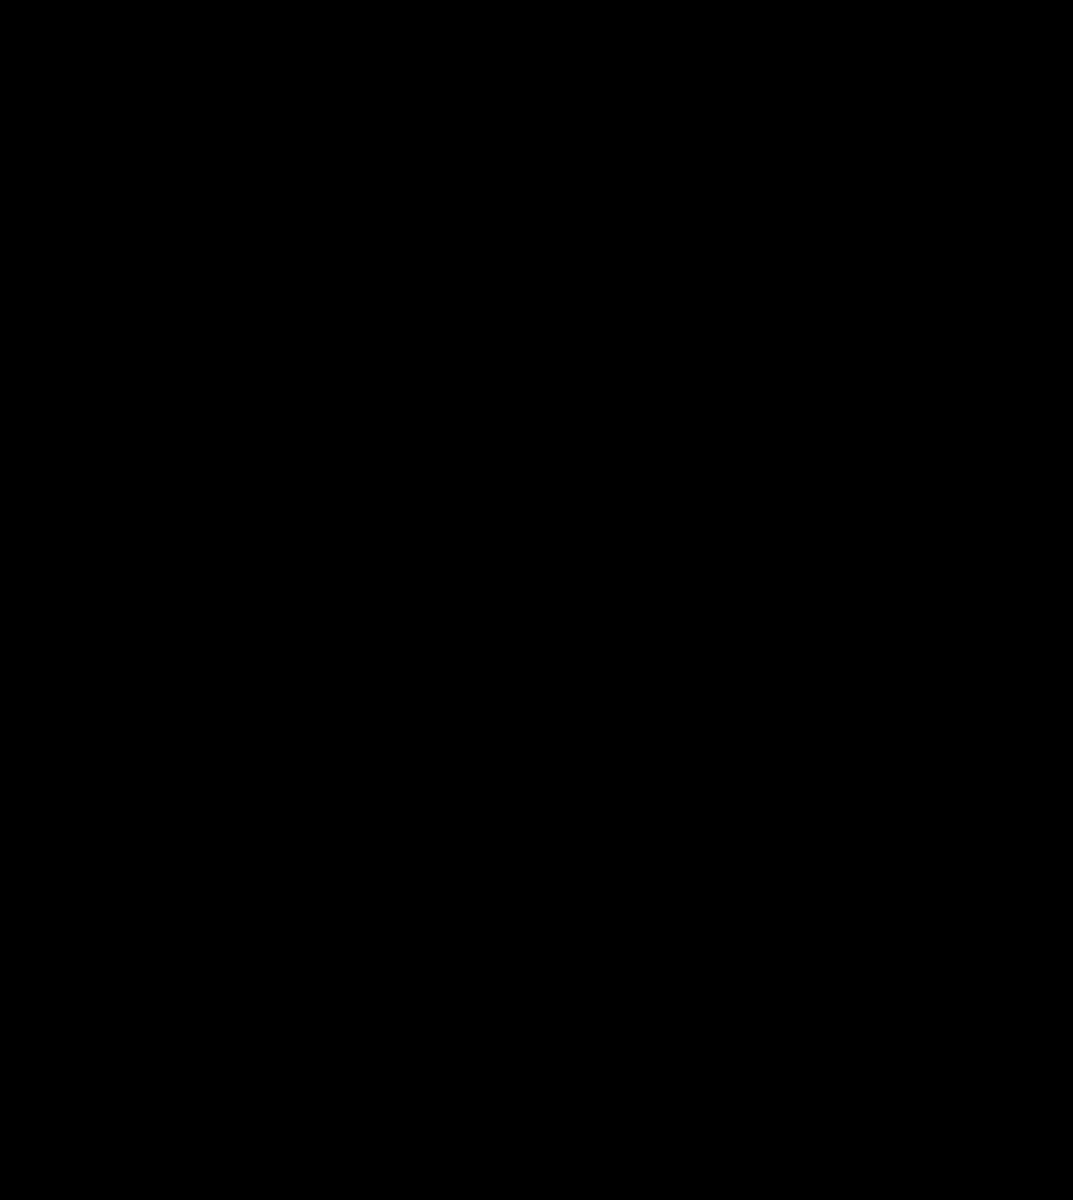 Zaklamp LED Campinglamp – Oplaadbaar – Waterdicht – Powerbank – KM-M17